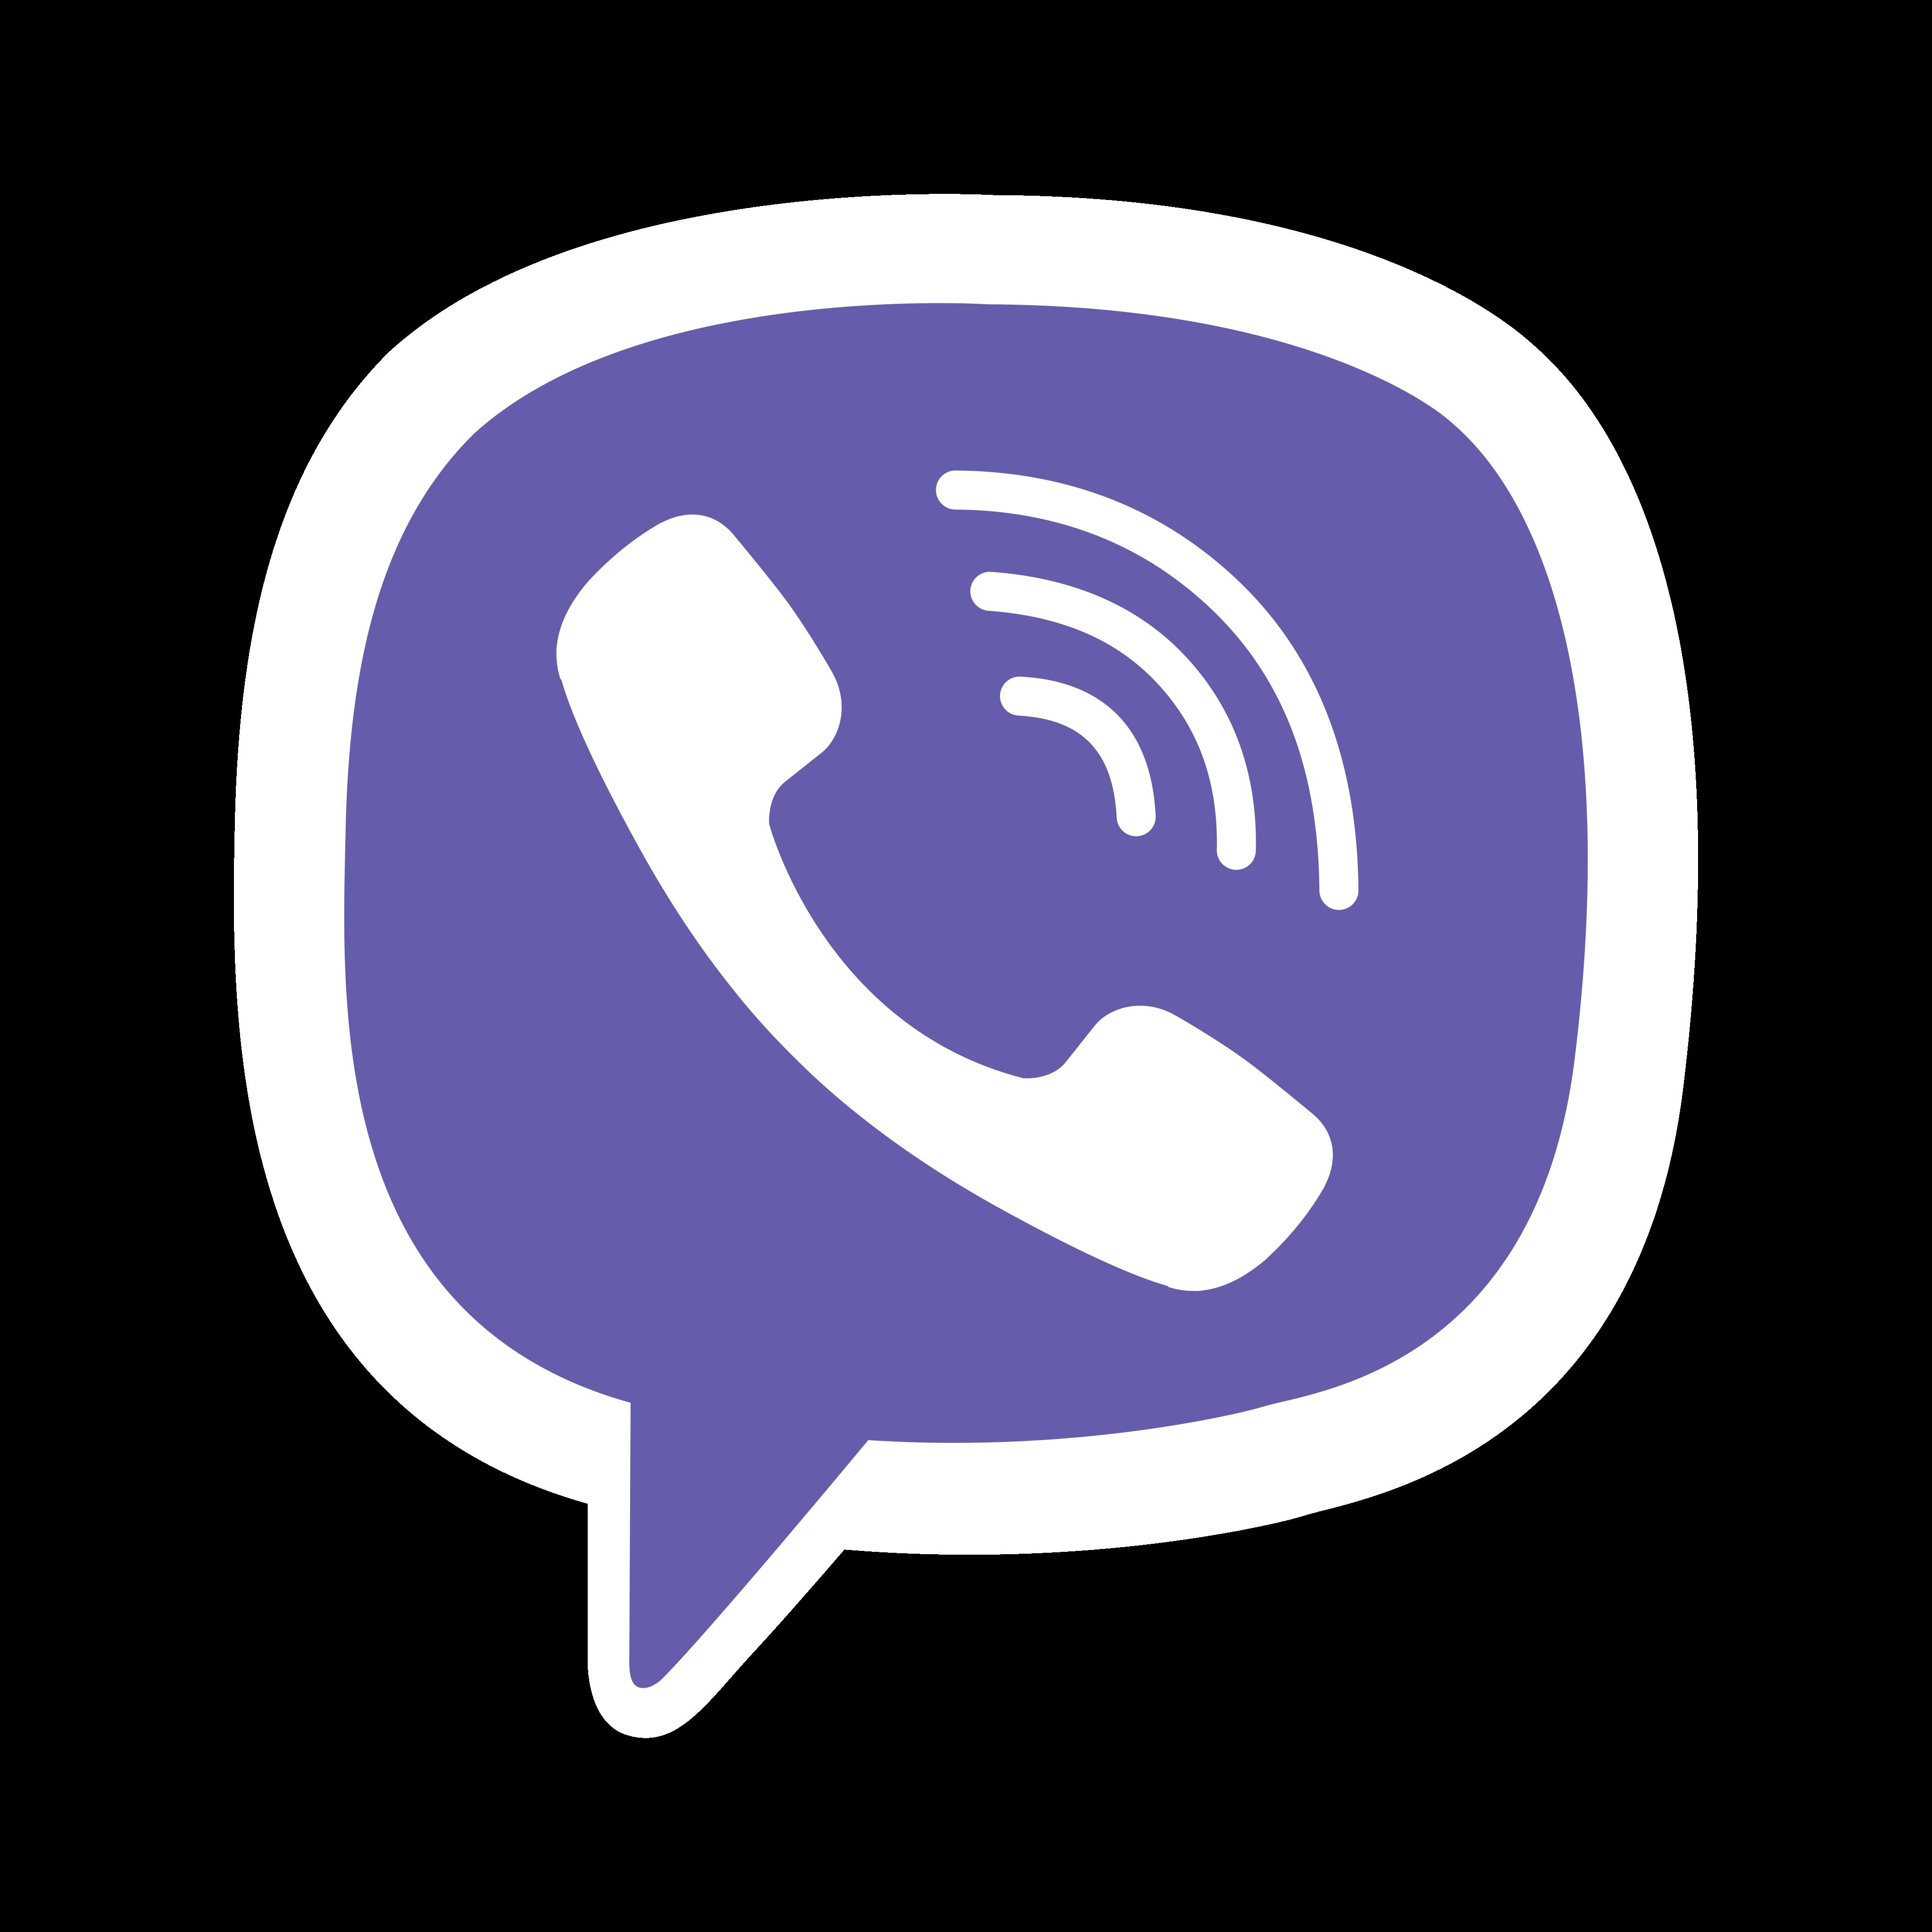 viber logo 0 - Rakuten Viber Logo - Icon